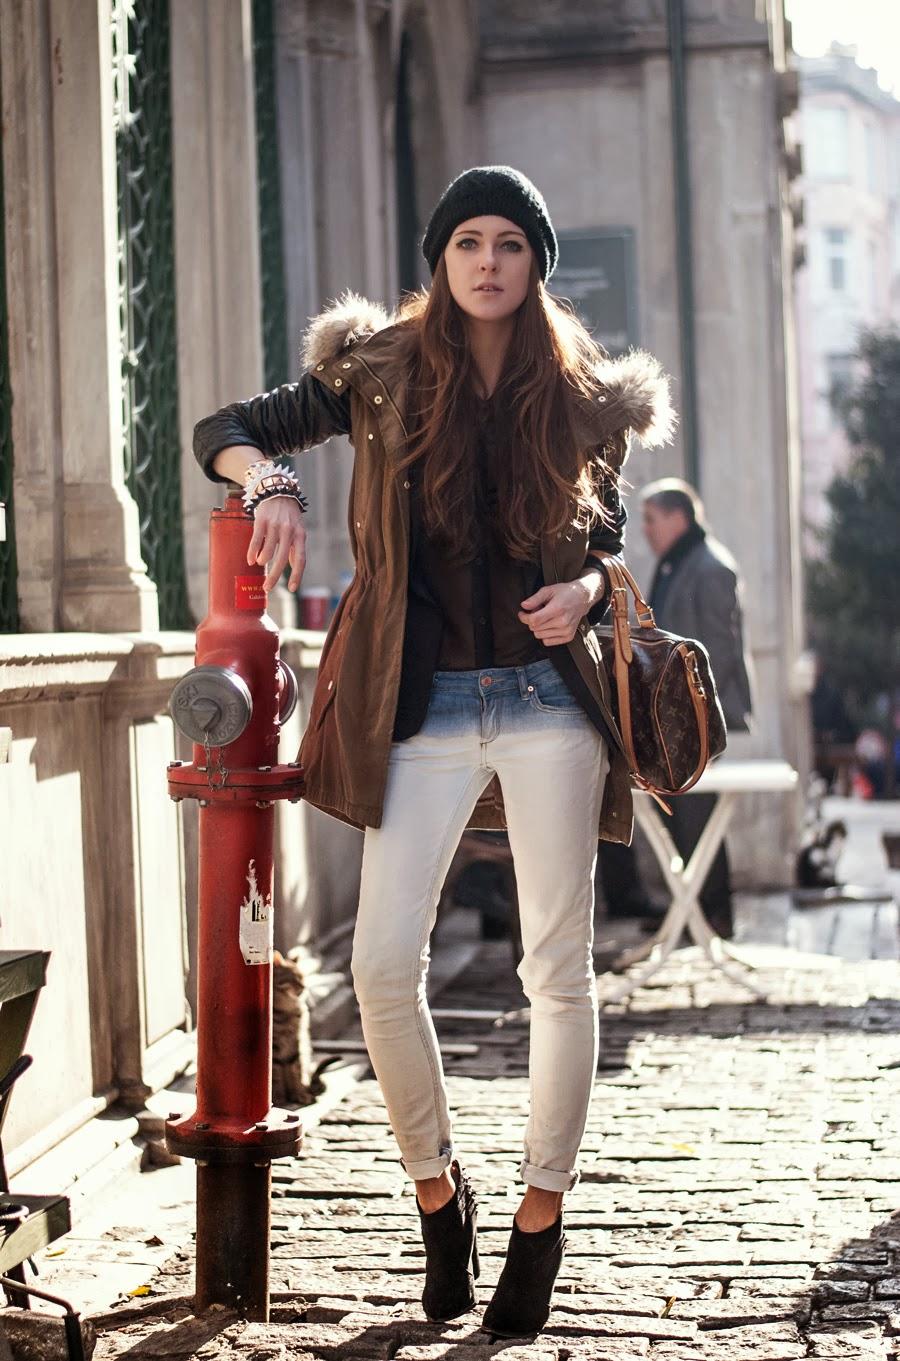 fashion blogger, parka jacket outfit, mango parka jacket, street style 2013, fashion blogger, neon rock katerina kraynova, details, oasap accessories, style details